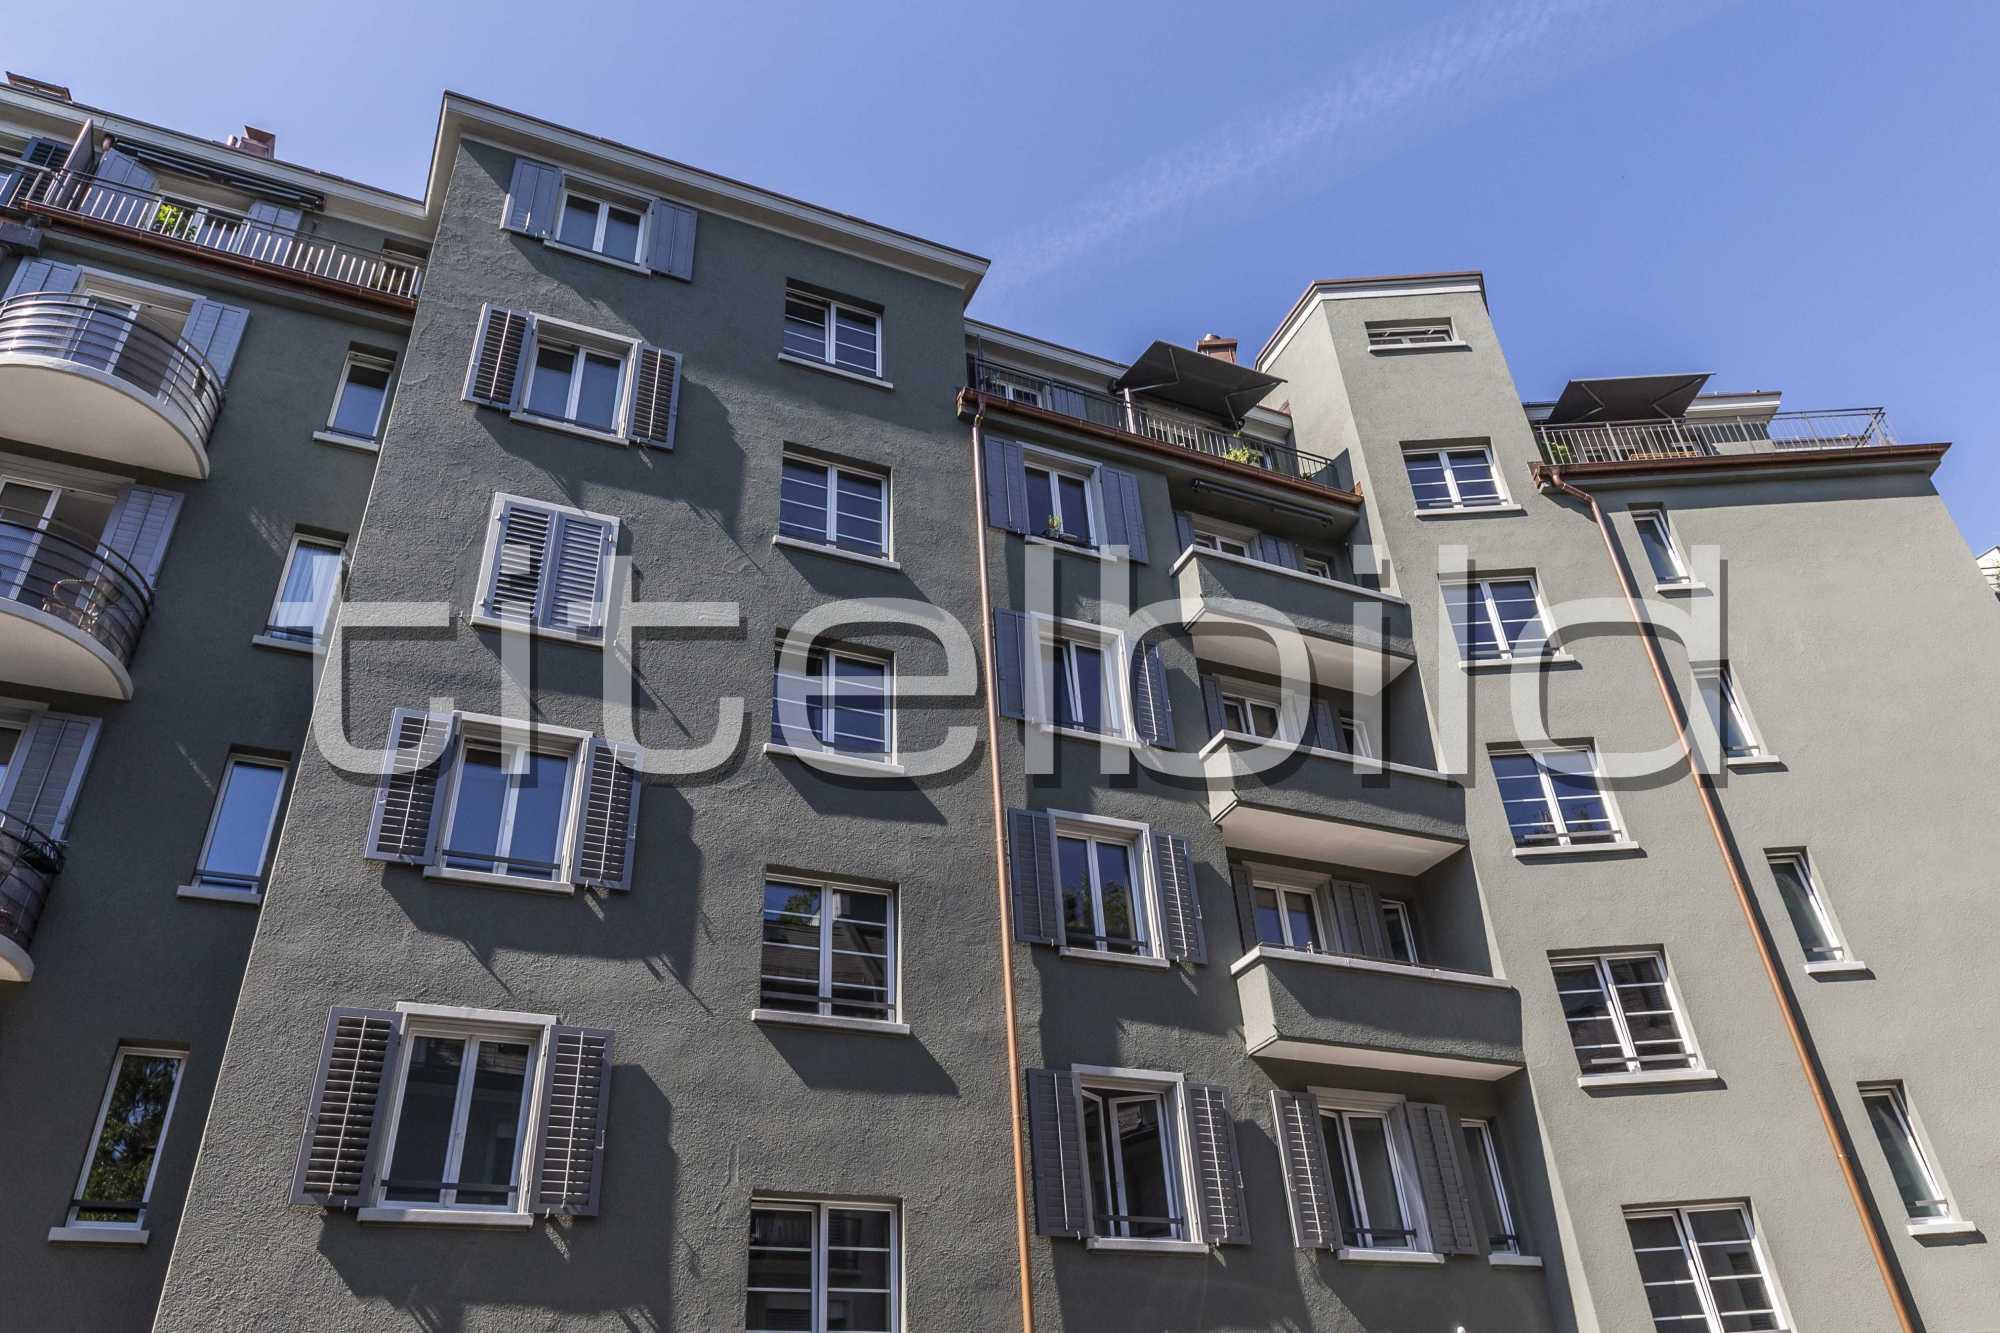 Projektbild-Nr. 4: WGH Röntgenstrasse 4 & 6 in Zürich